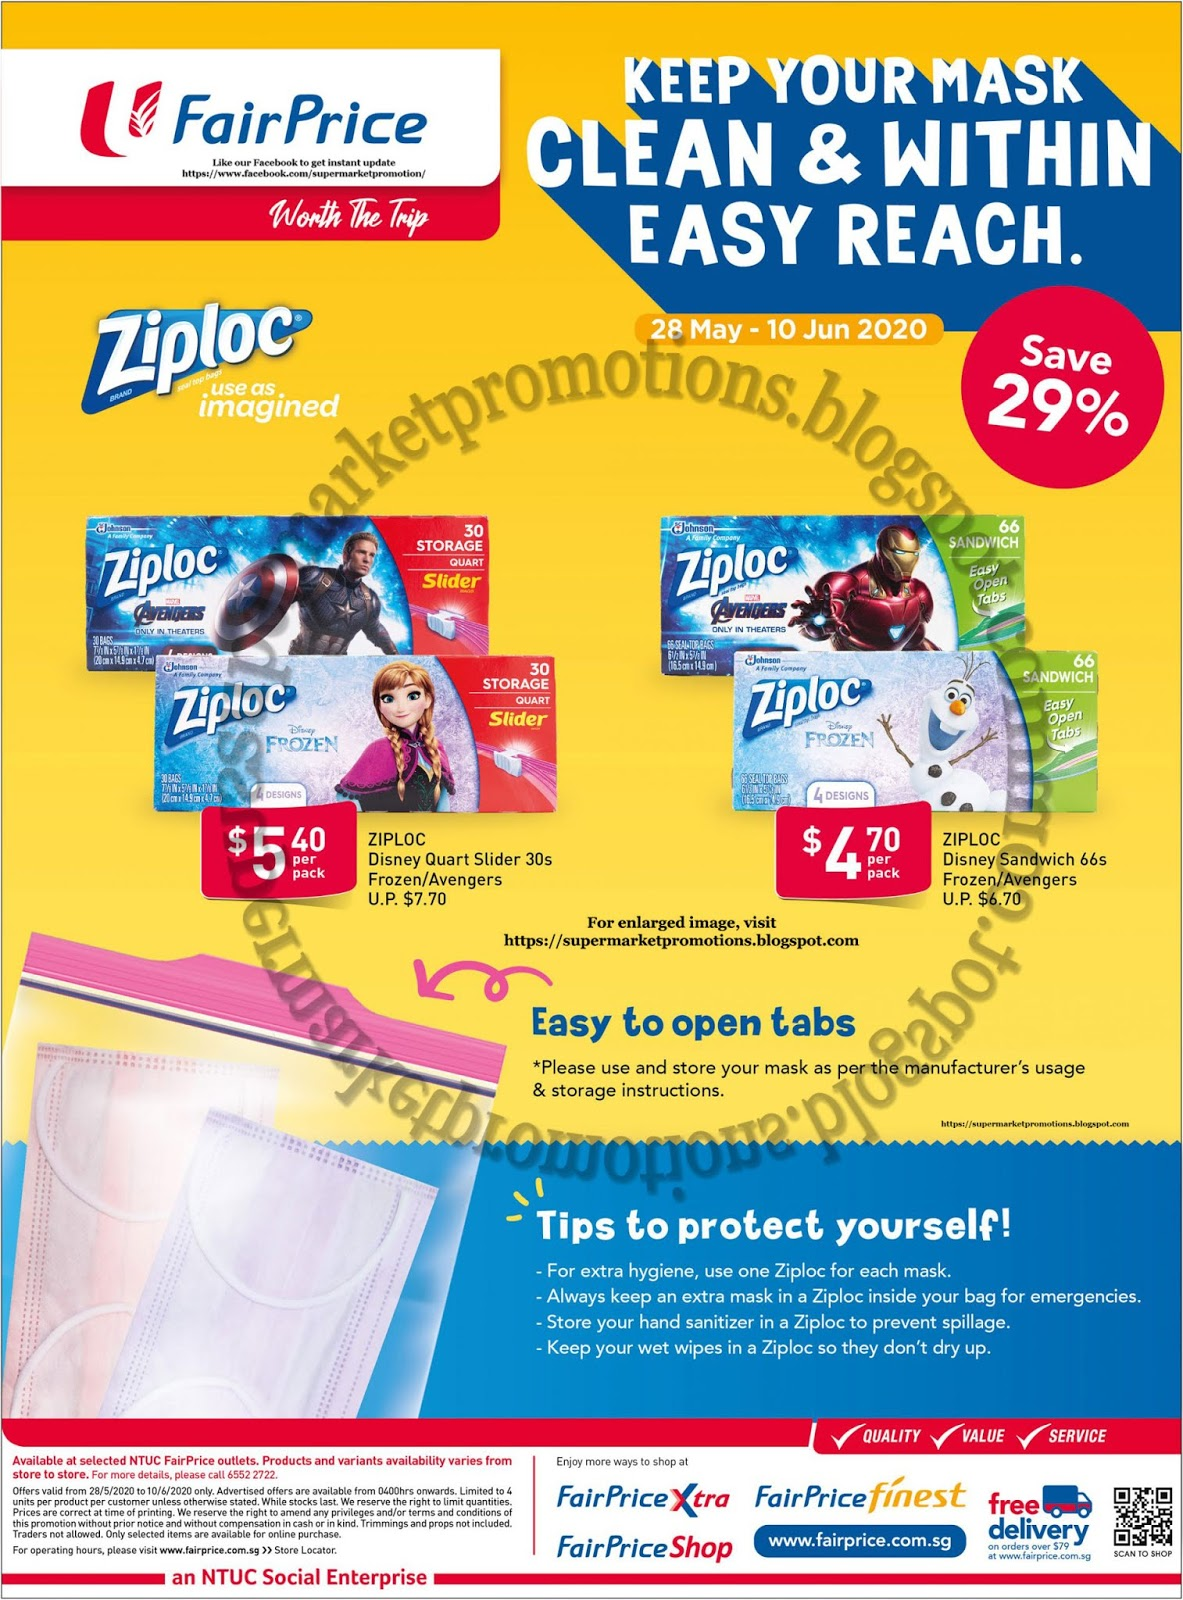 Ntuc Fairprice Ziploc Promotion 28 May